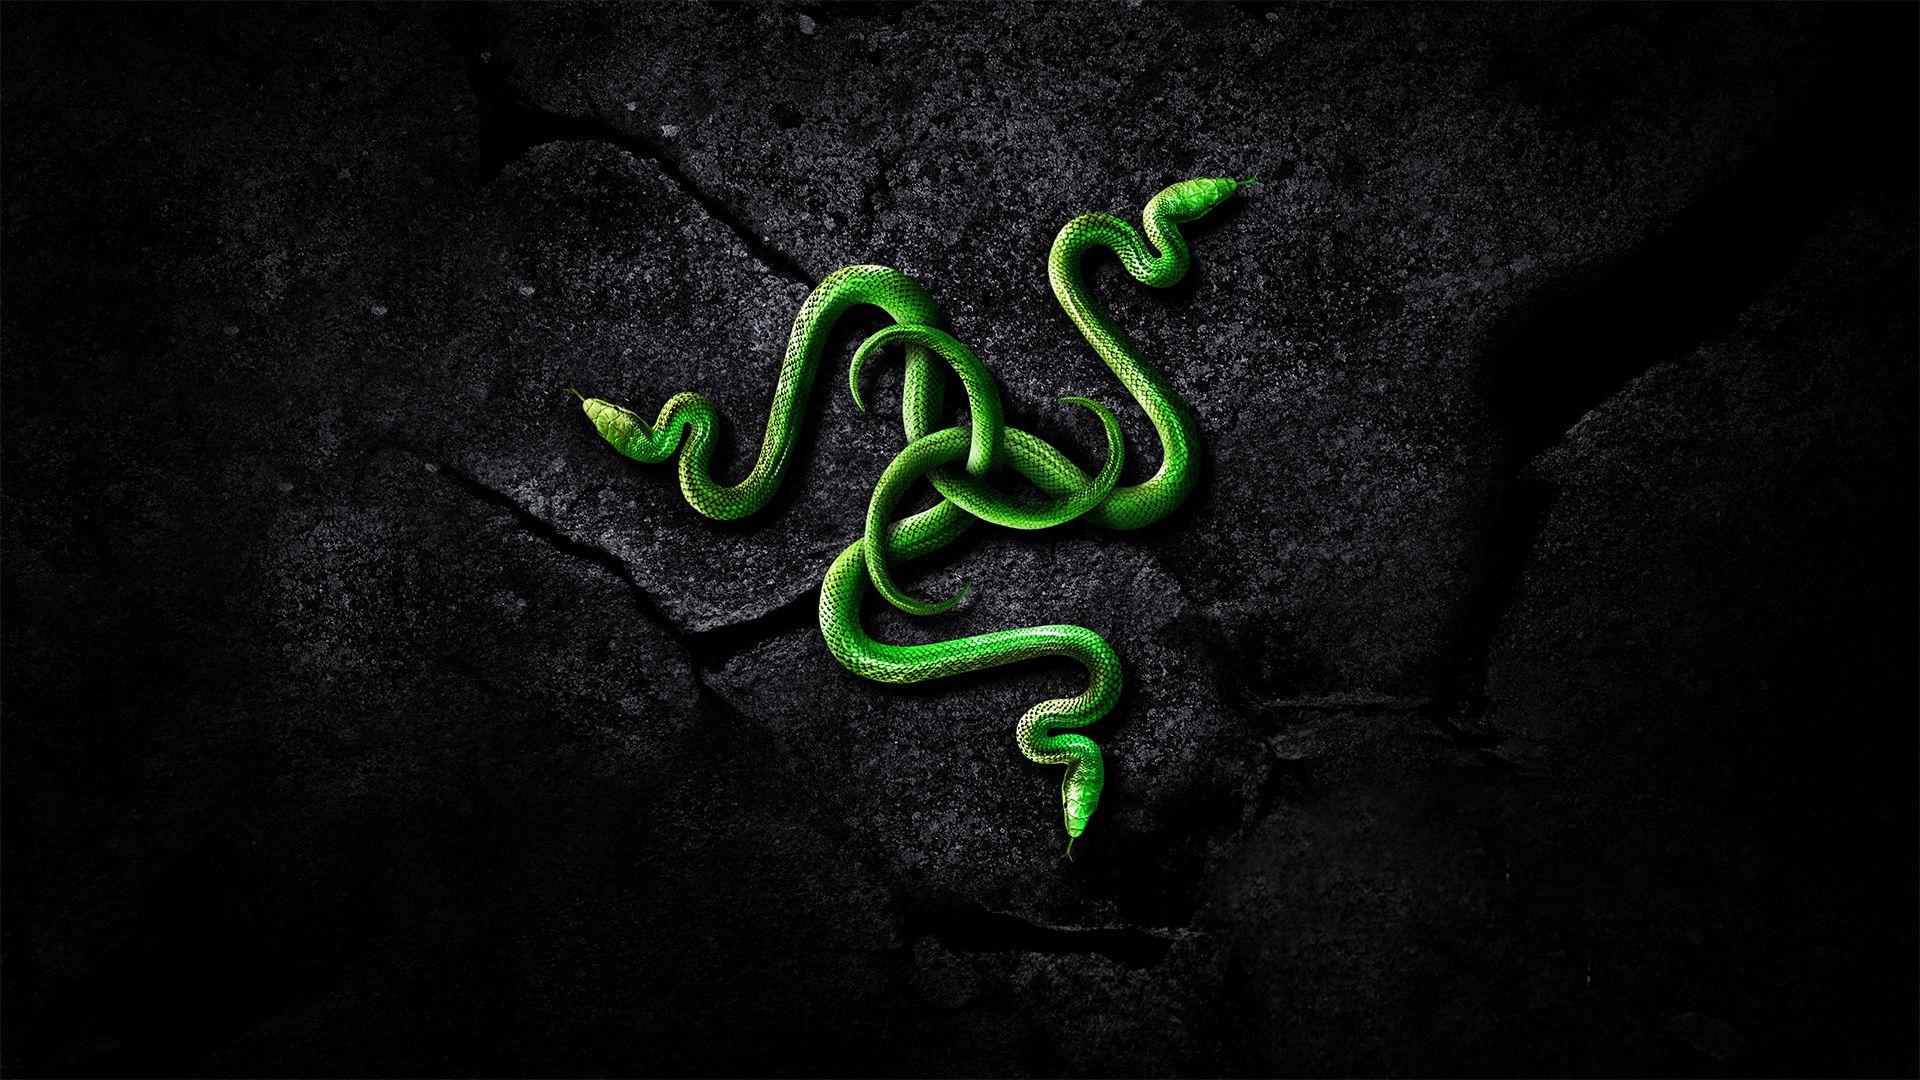 Razer Logo And Snake Wallpaper Обои для рабочего стола